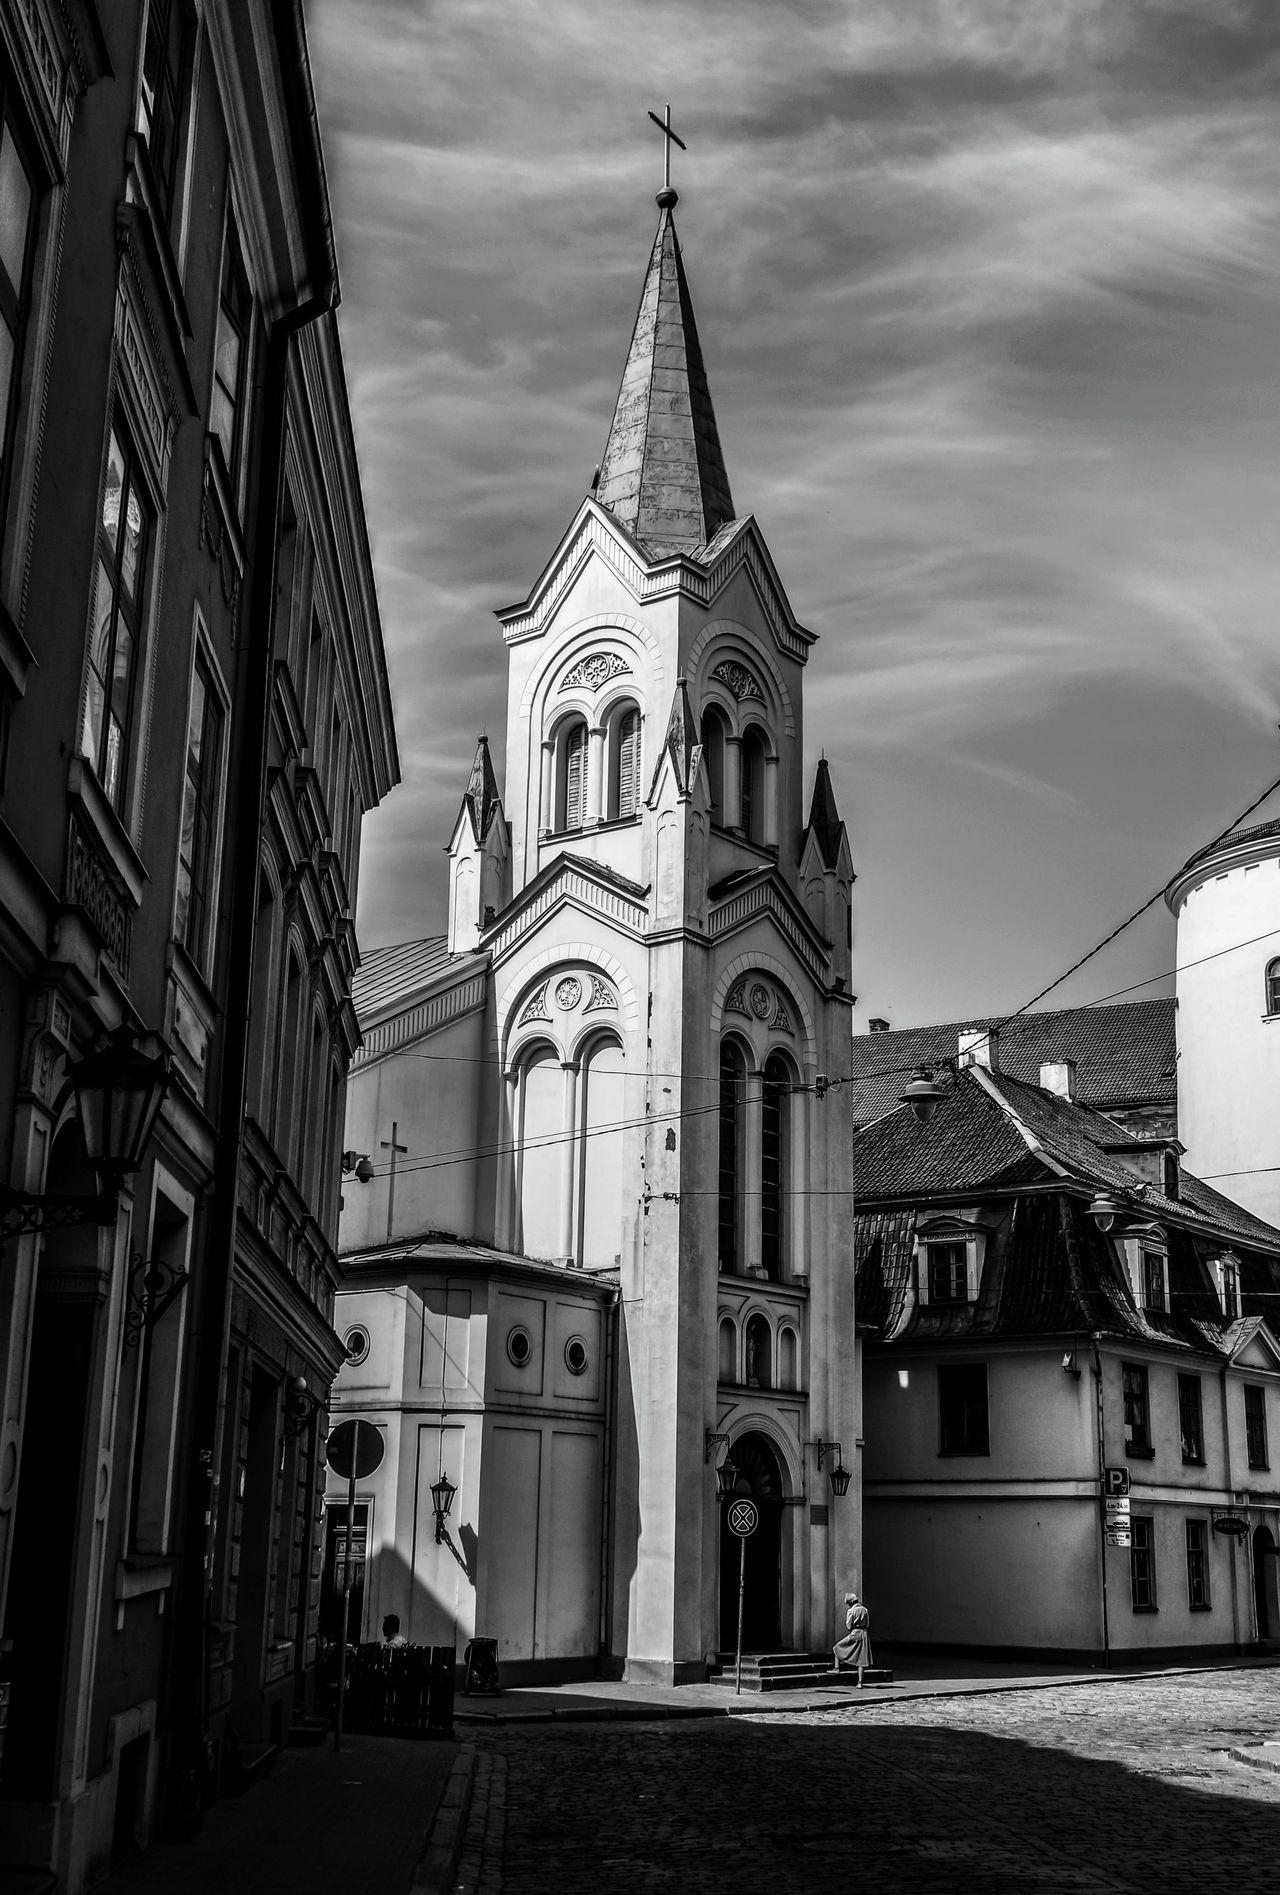 Architecture Religion Travel Destinations Building Exterior Outdoors Day MonochromePhotography Blackandwhite Photography Built Structure European Union Latvia Riga